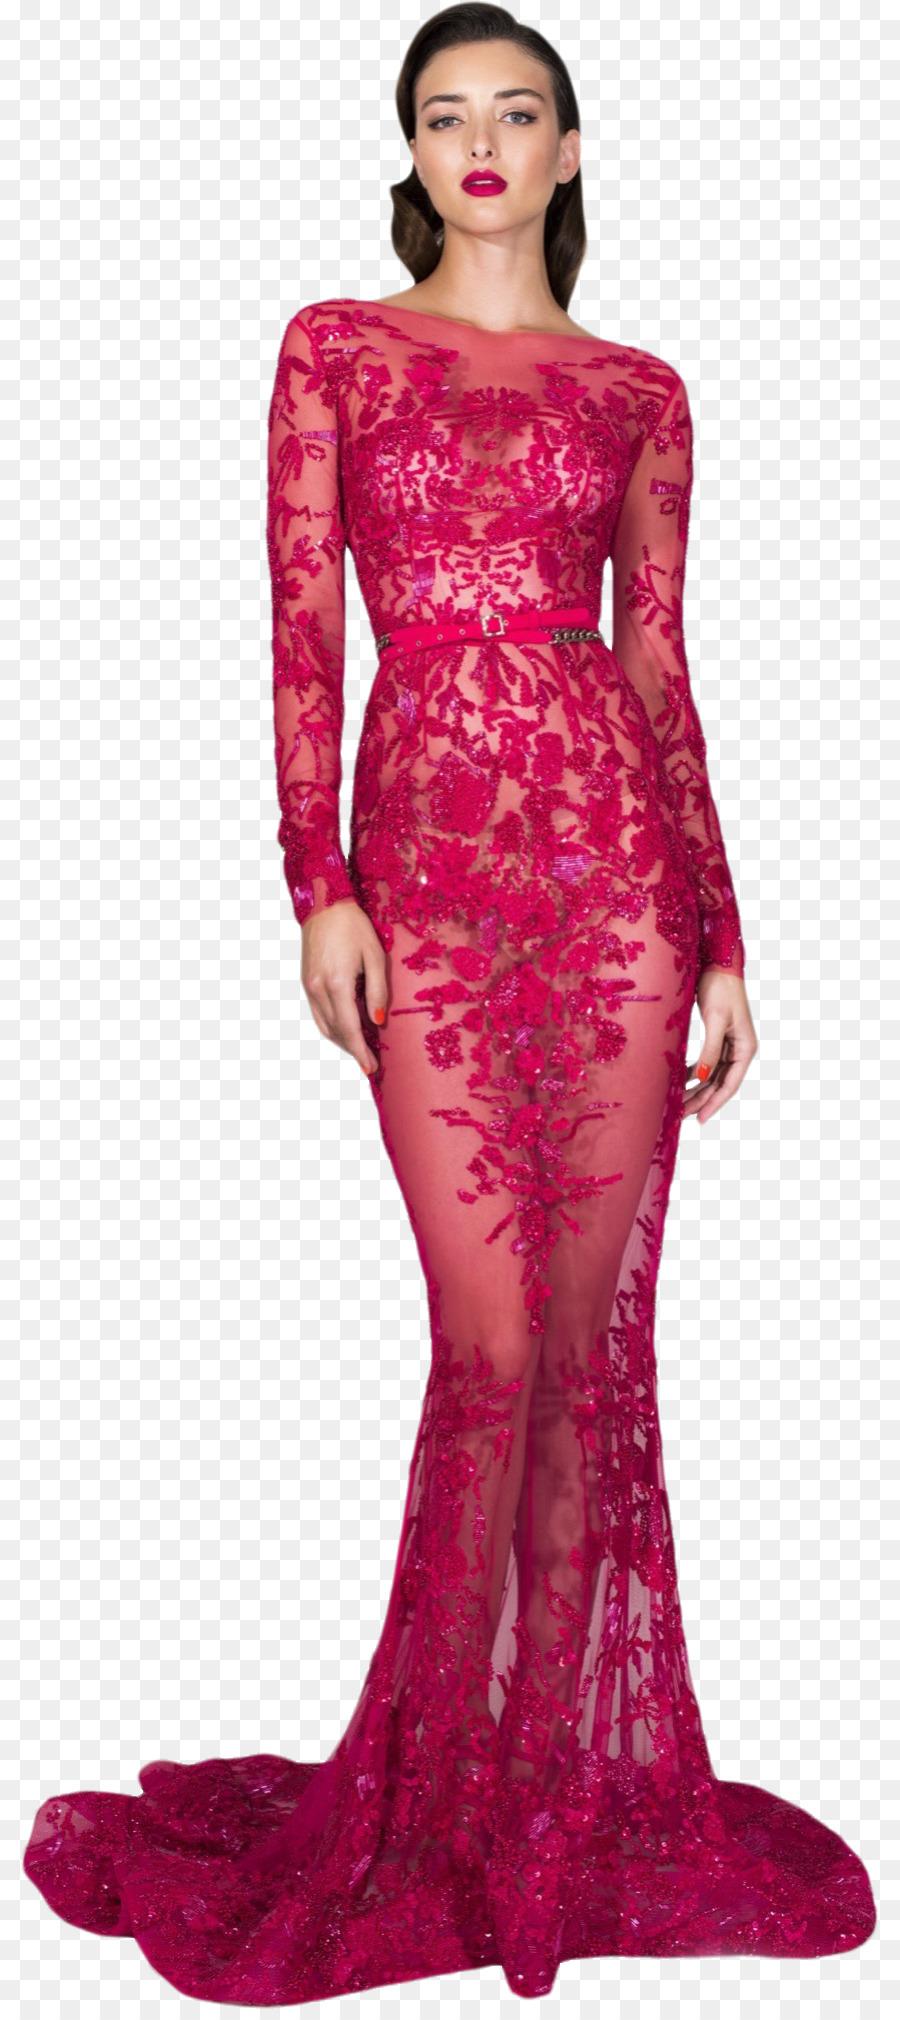 Desfile de moda de Alta costura vestido de Novia - vestido png ...